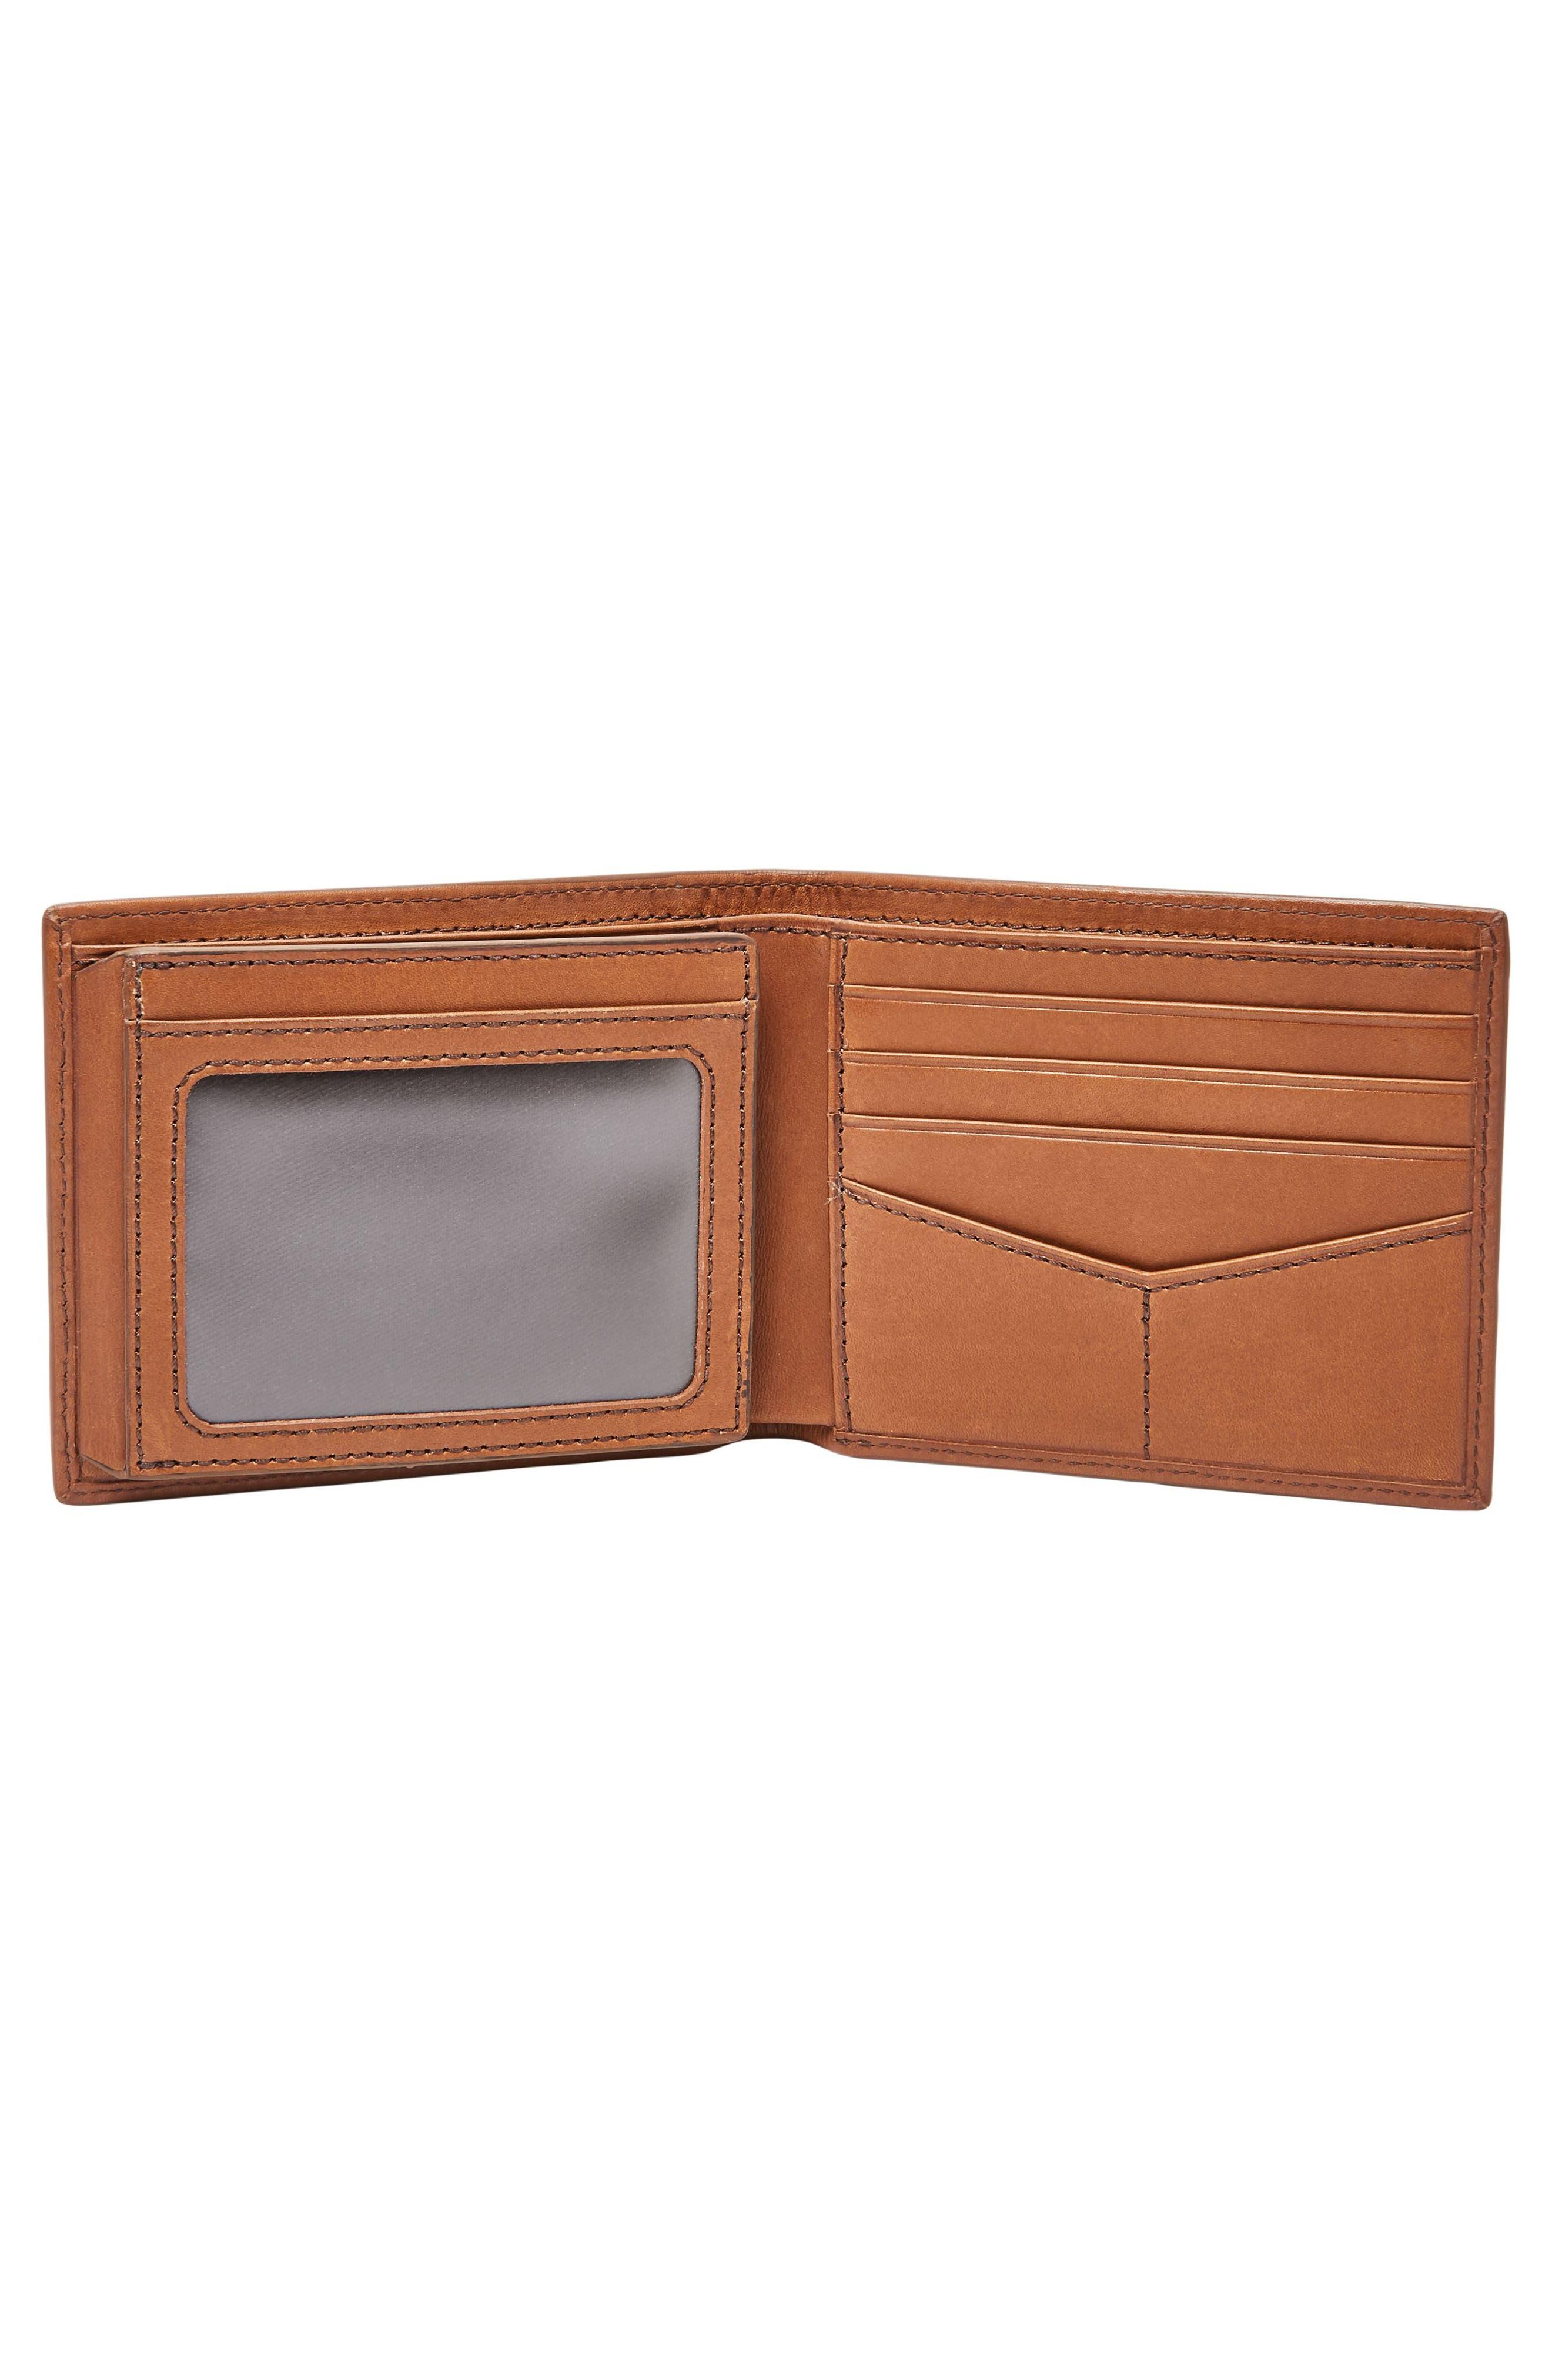 Paul Leather Wallet,                             Alternate thumbnail 2, color,                             222